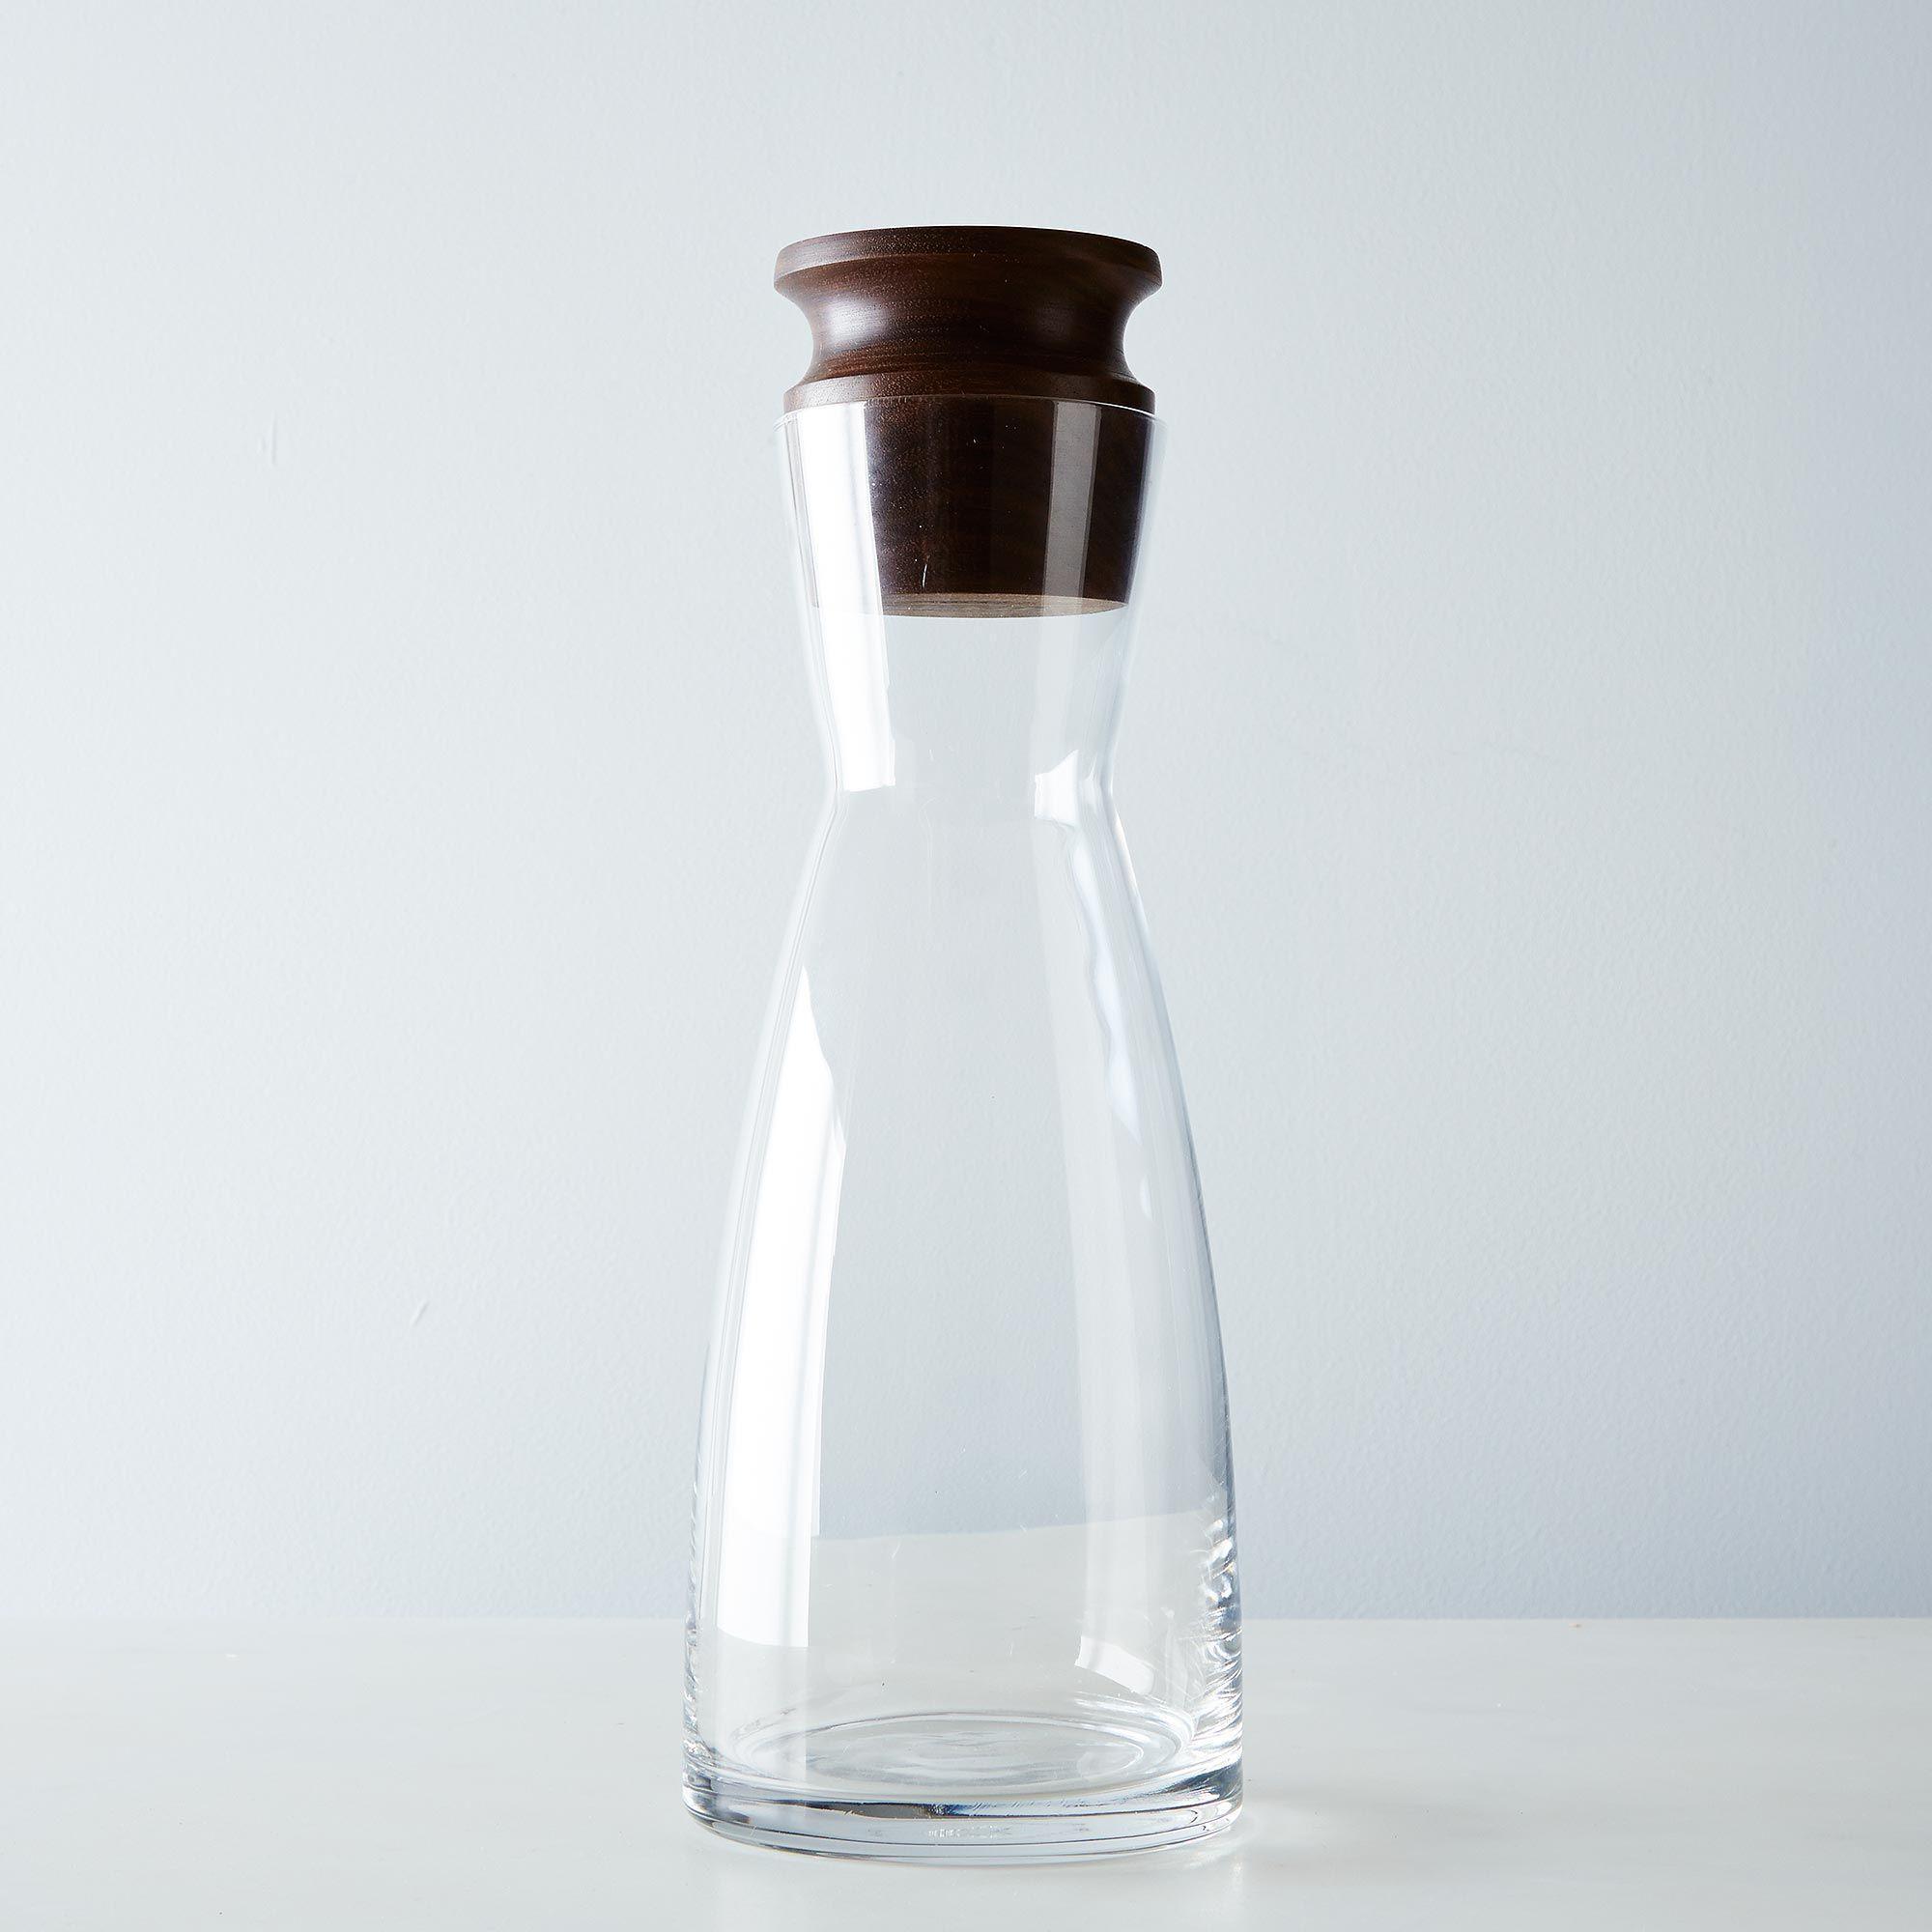 Liter Glass Carafe With Walnut Stop Glass Carafe Carafe Glass